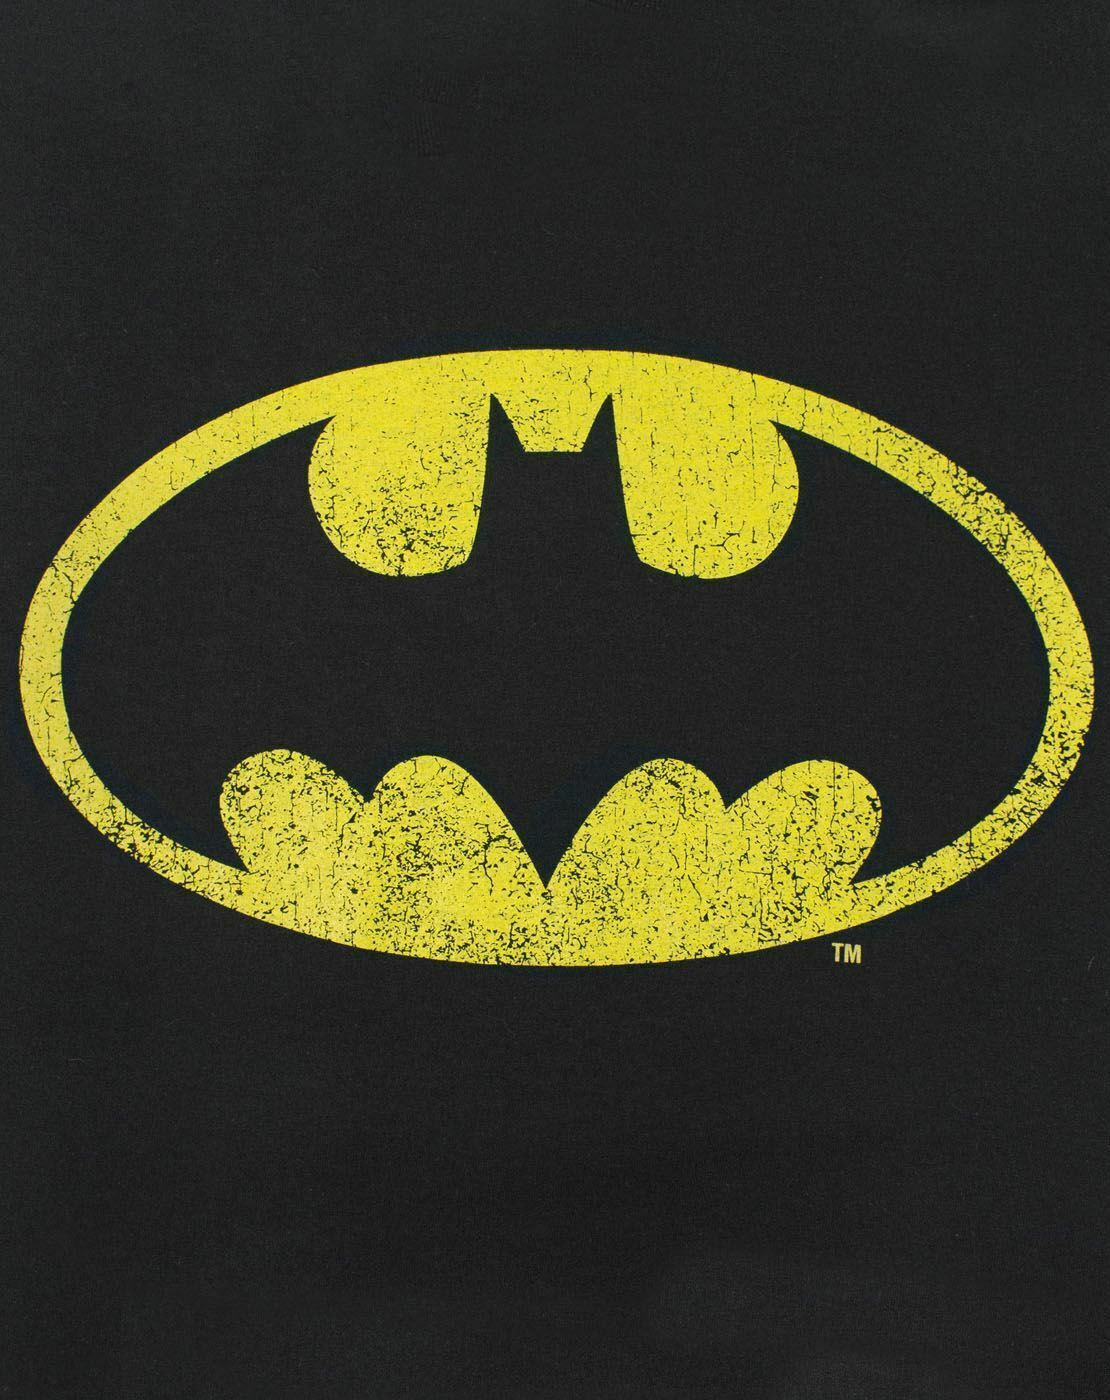 Batman-Distressed-Logo-Men-039-s-Adults-Black-T-Shirt-Top thumbnail 11